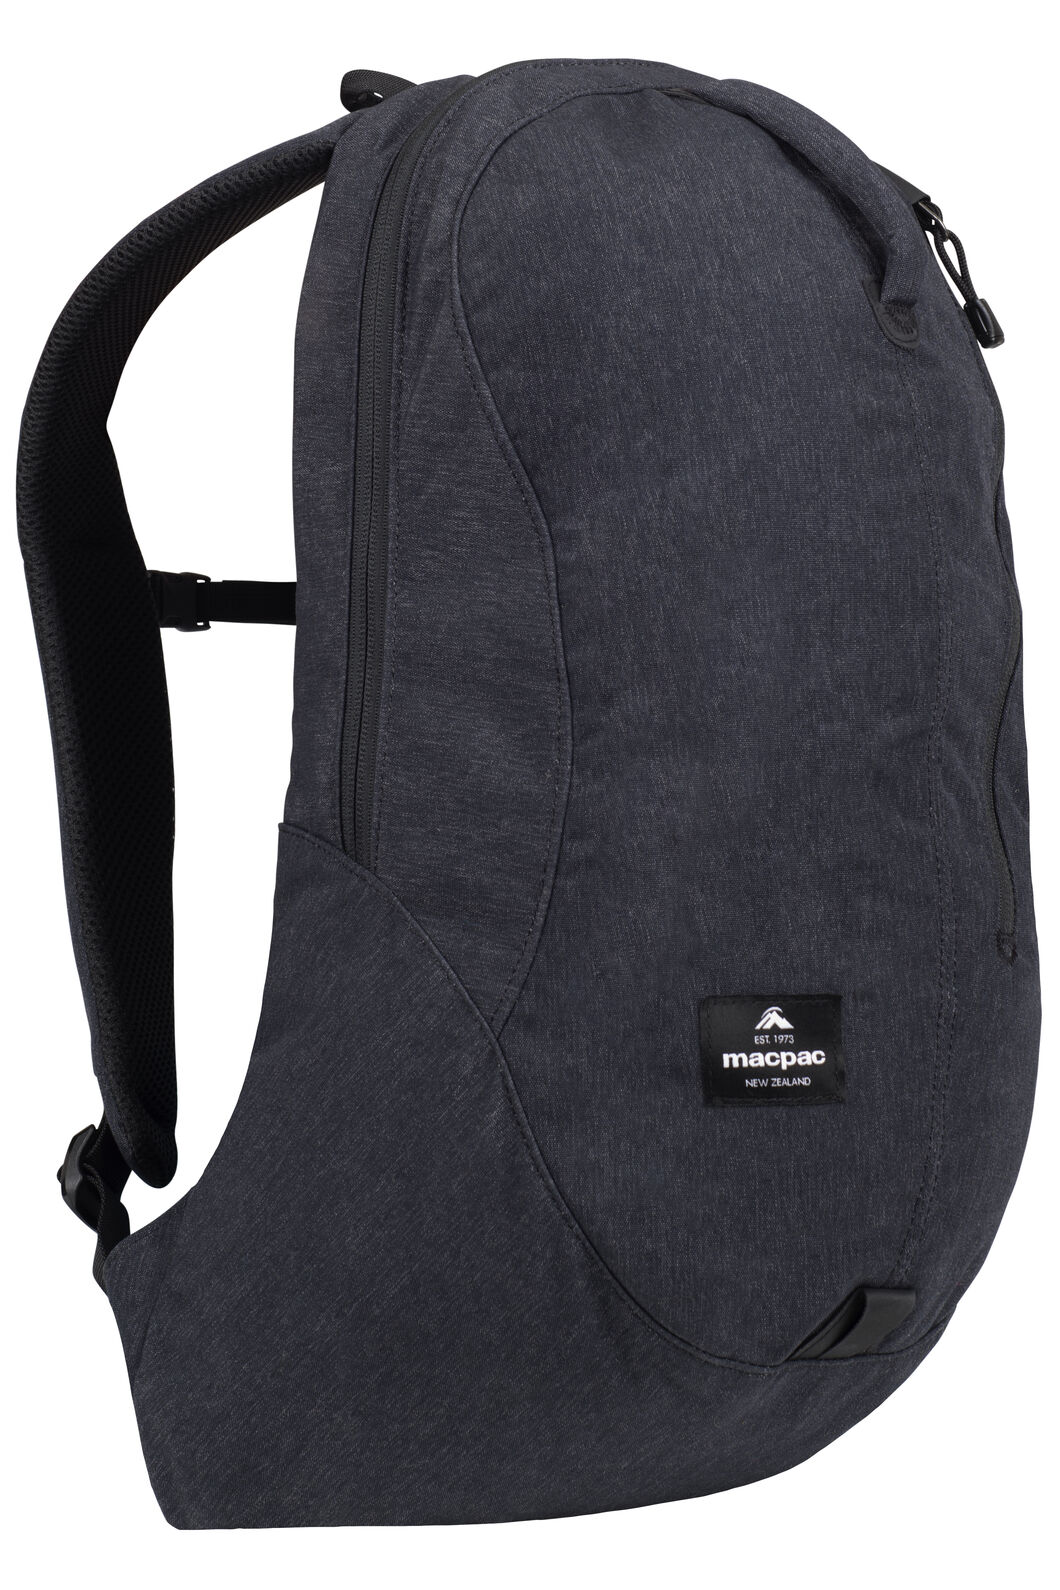 Kahuna 18L Urban Backpack, Black, hi-res